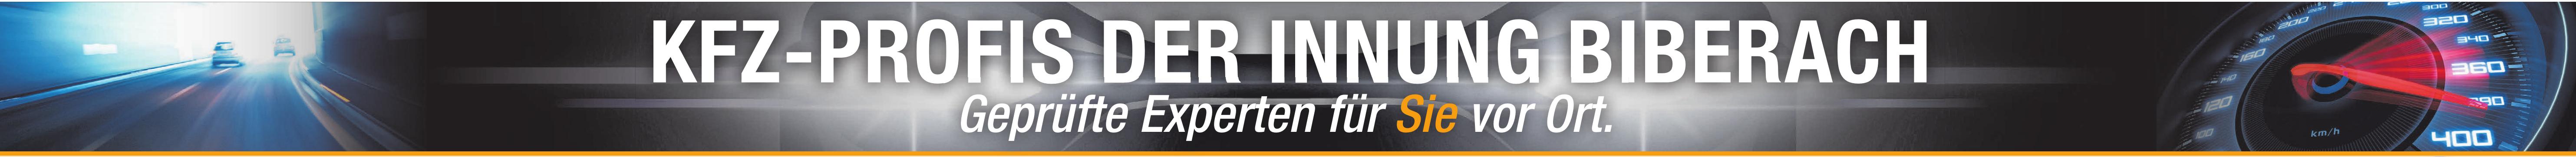 Martin Vöhringer ist neuer Obermeister der Kfz-Innung Biberach Image 1